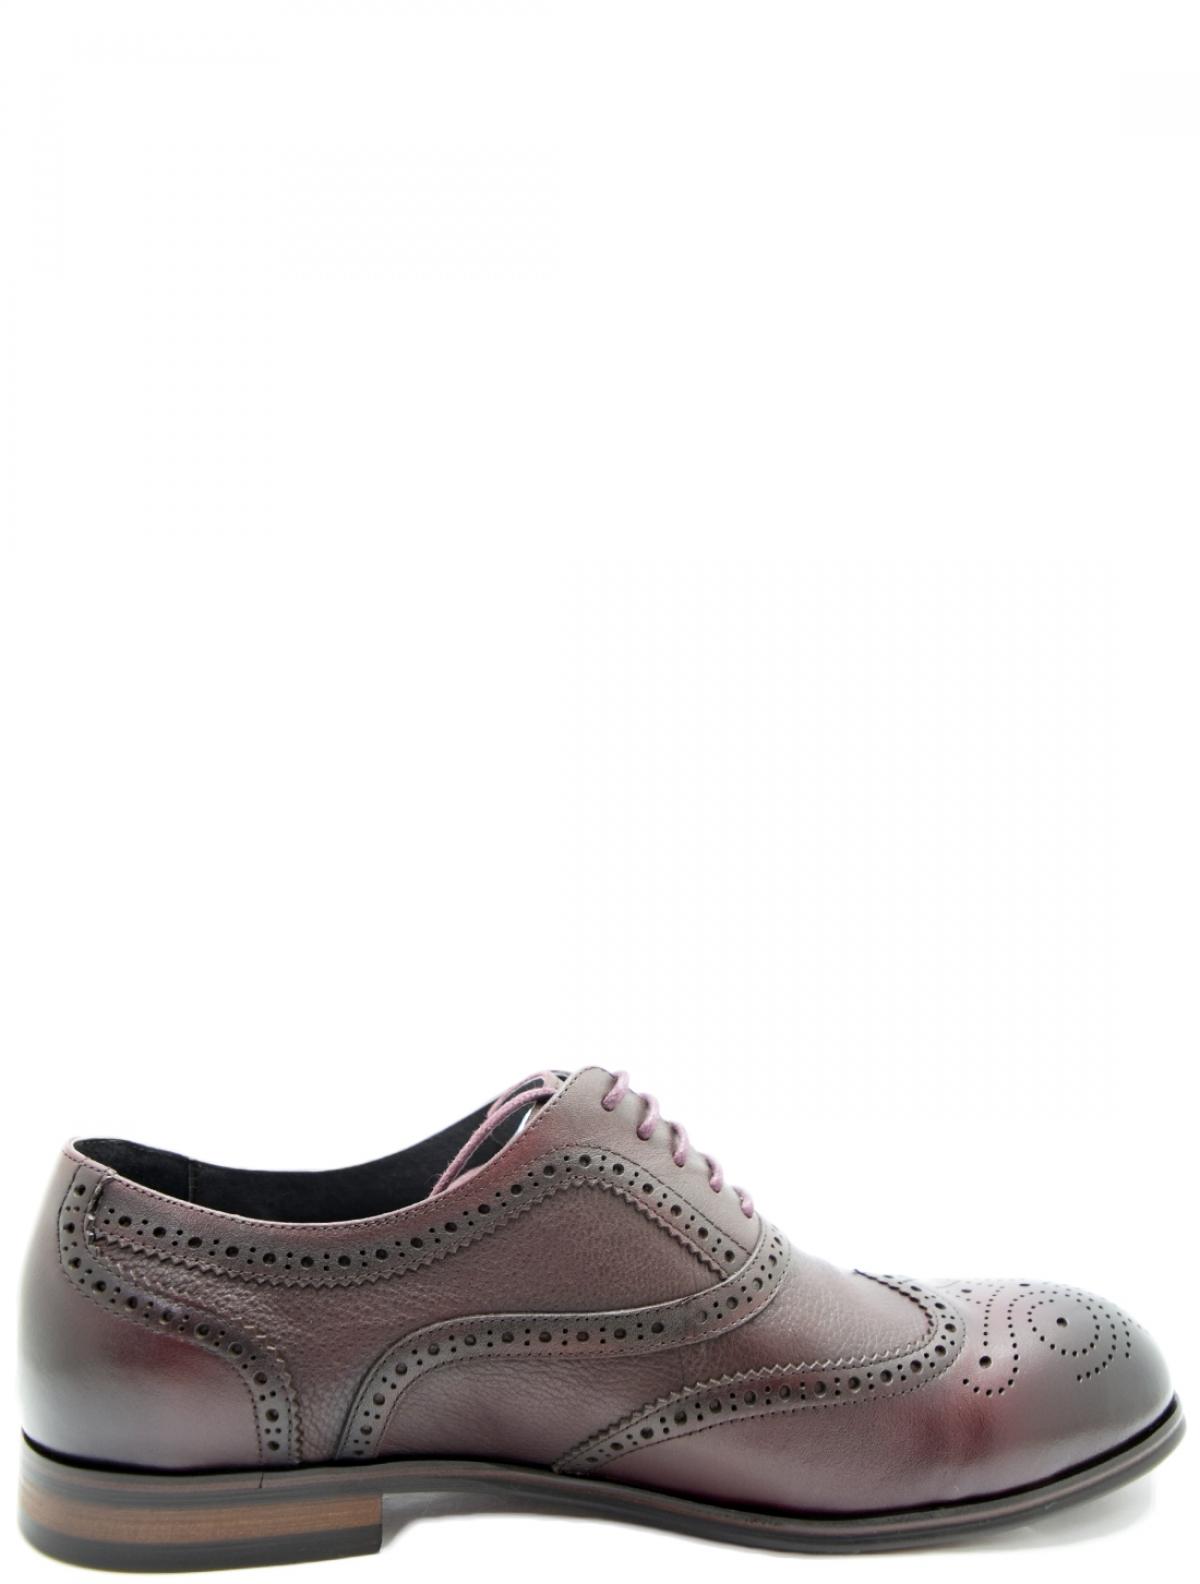 Roscote B288-D22-SW1-T2748 мужские туфли